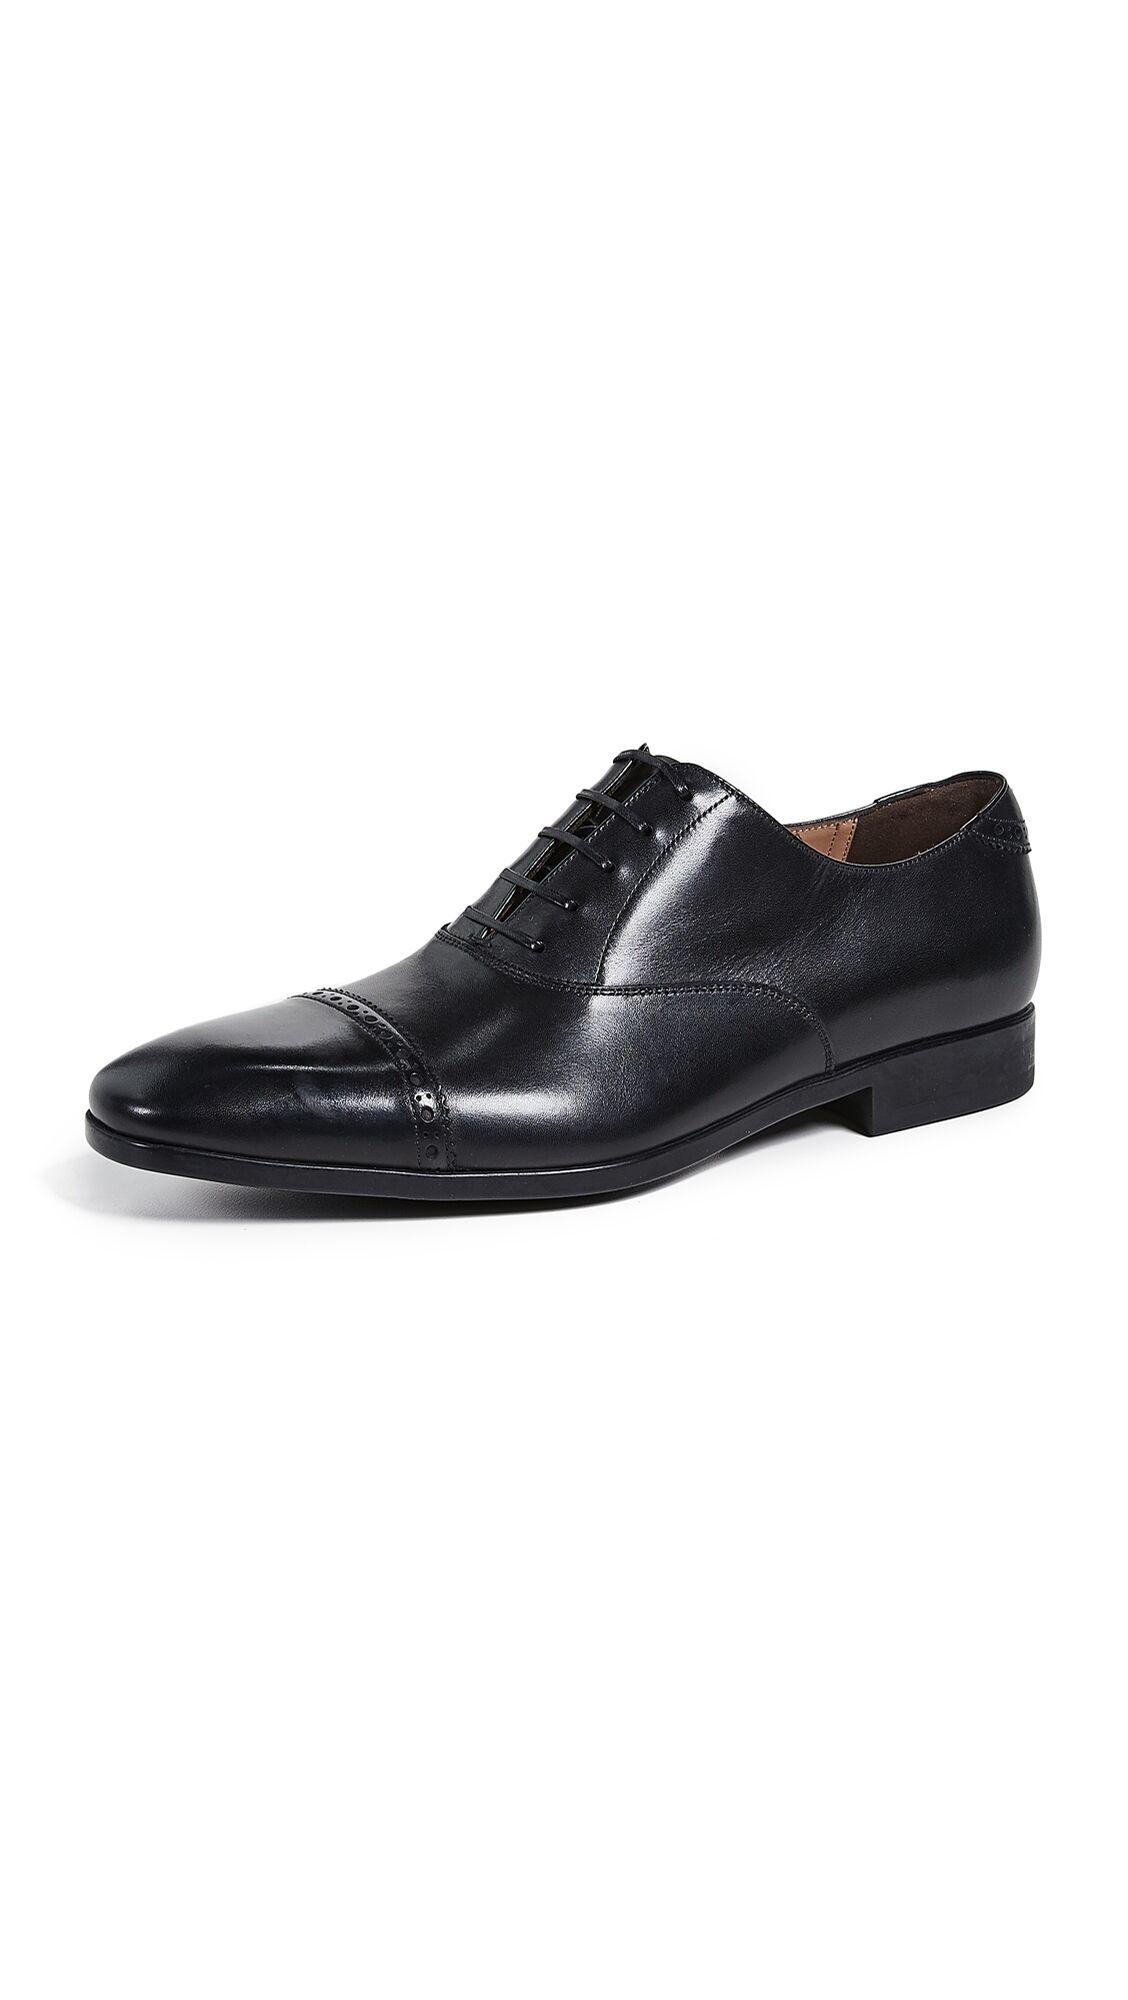 Salvatore Ferragamo Boston Cap Toe Lace Up Shoes - Black - Size: 8